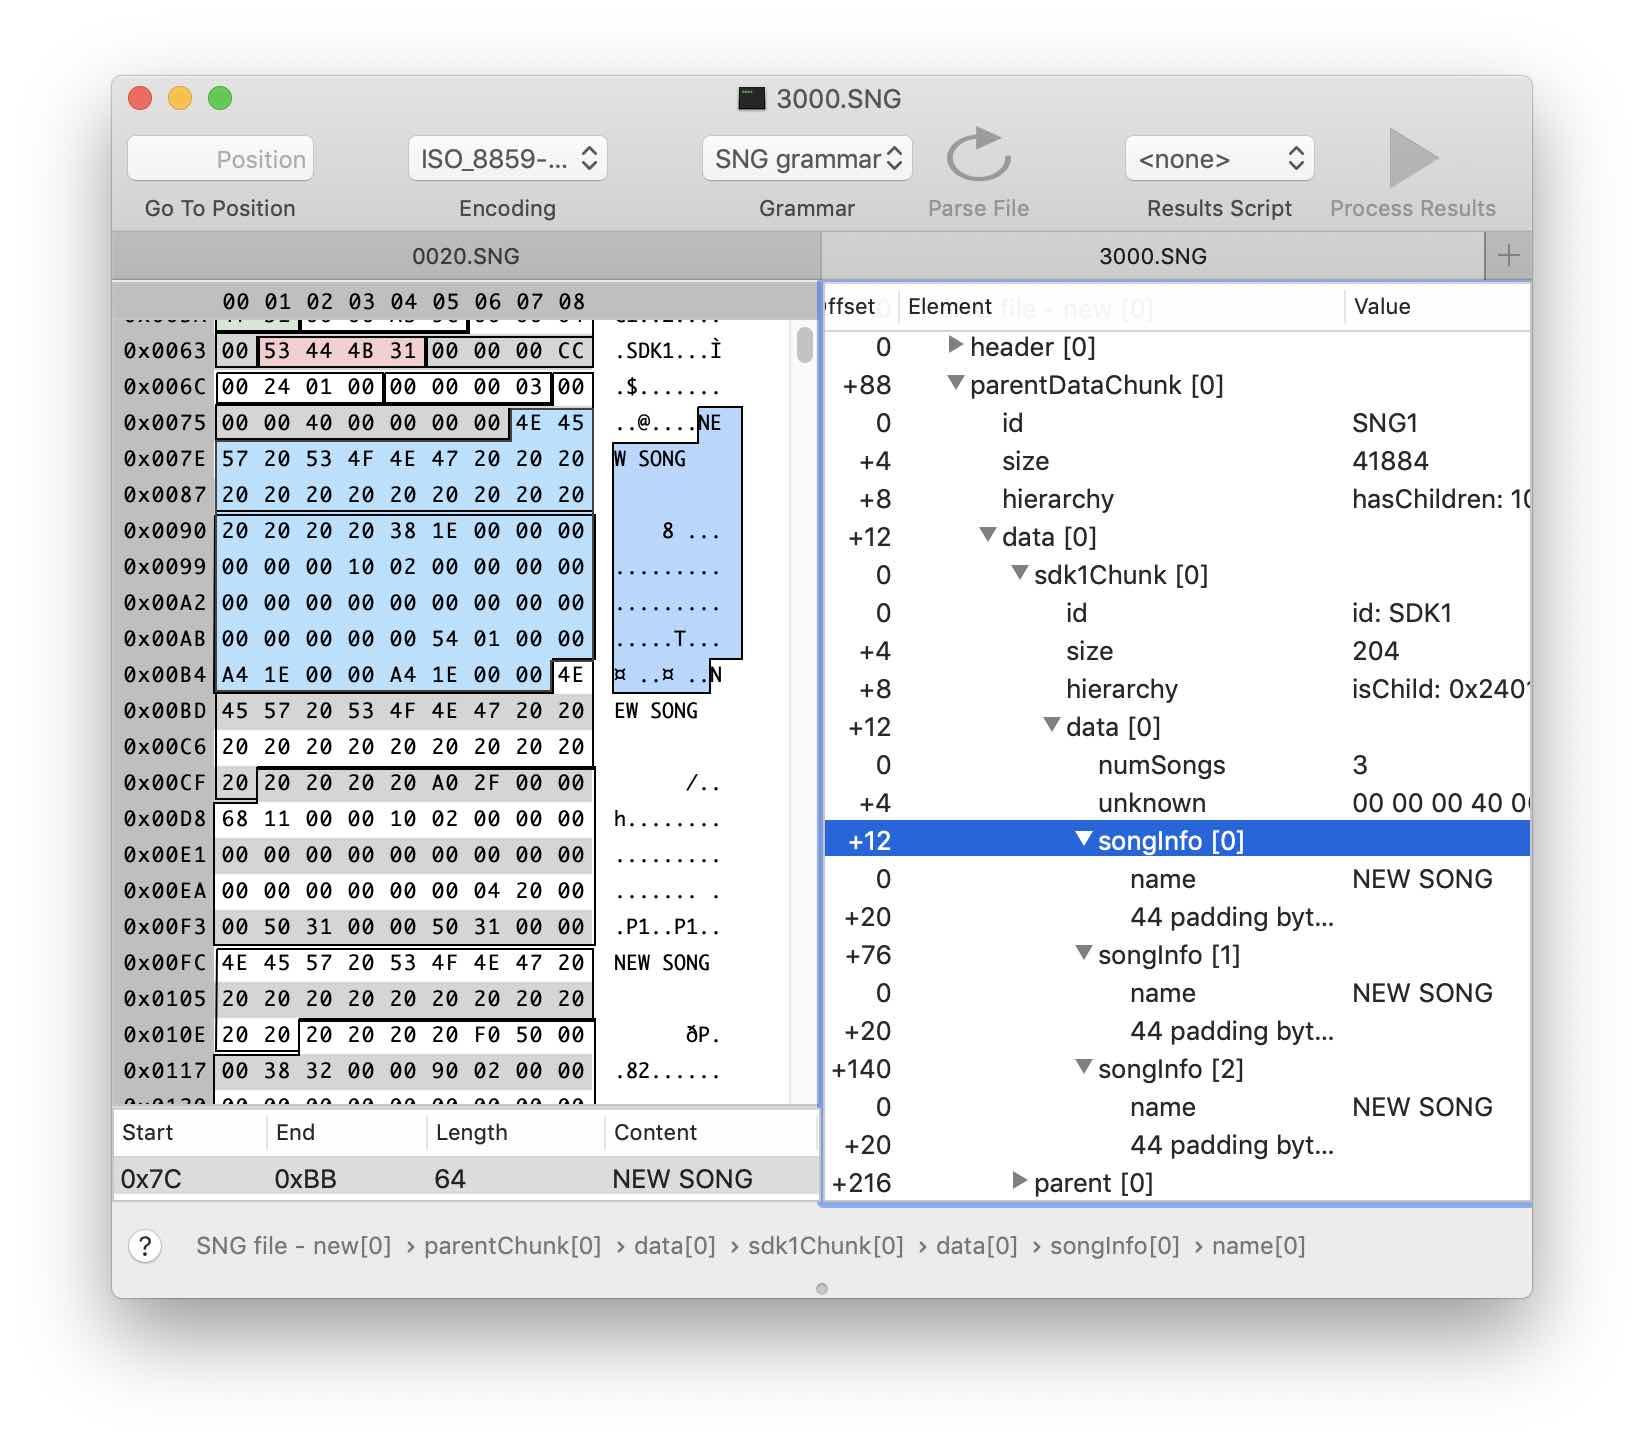 Реверс-инжиниринг бинарного формата на примере файлов Korg .SNG - 15